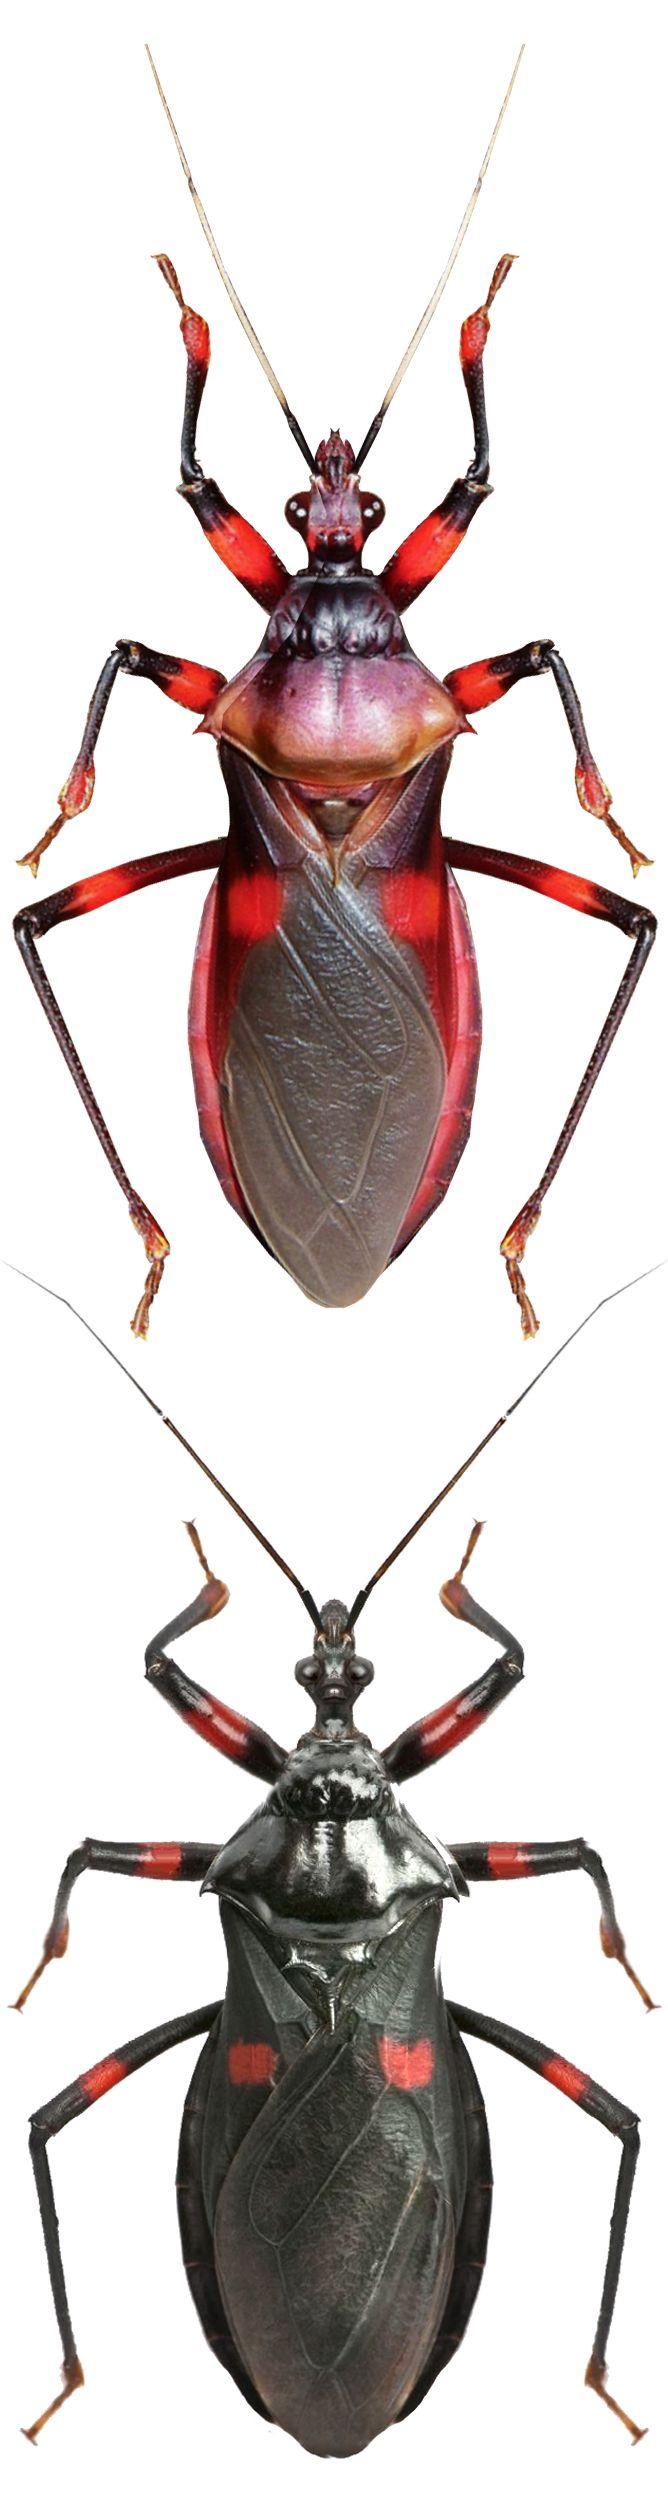 Platymeris rhadamantus